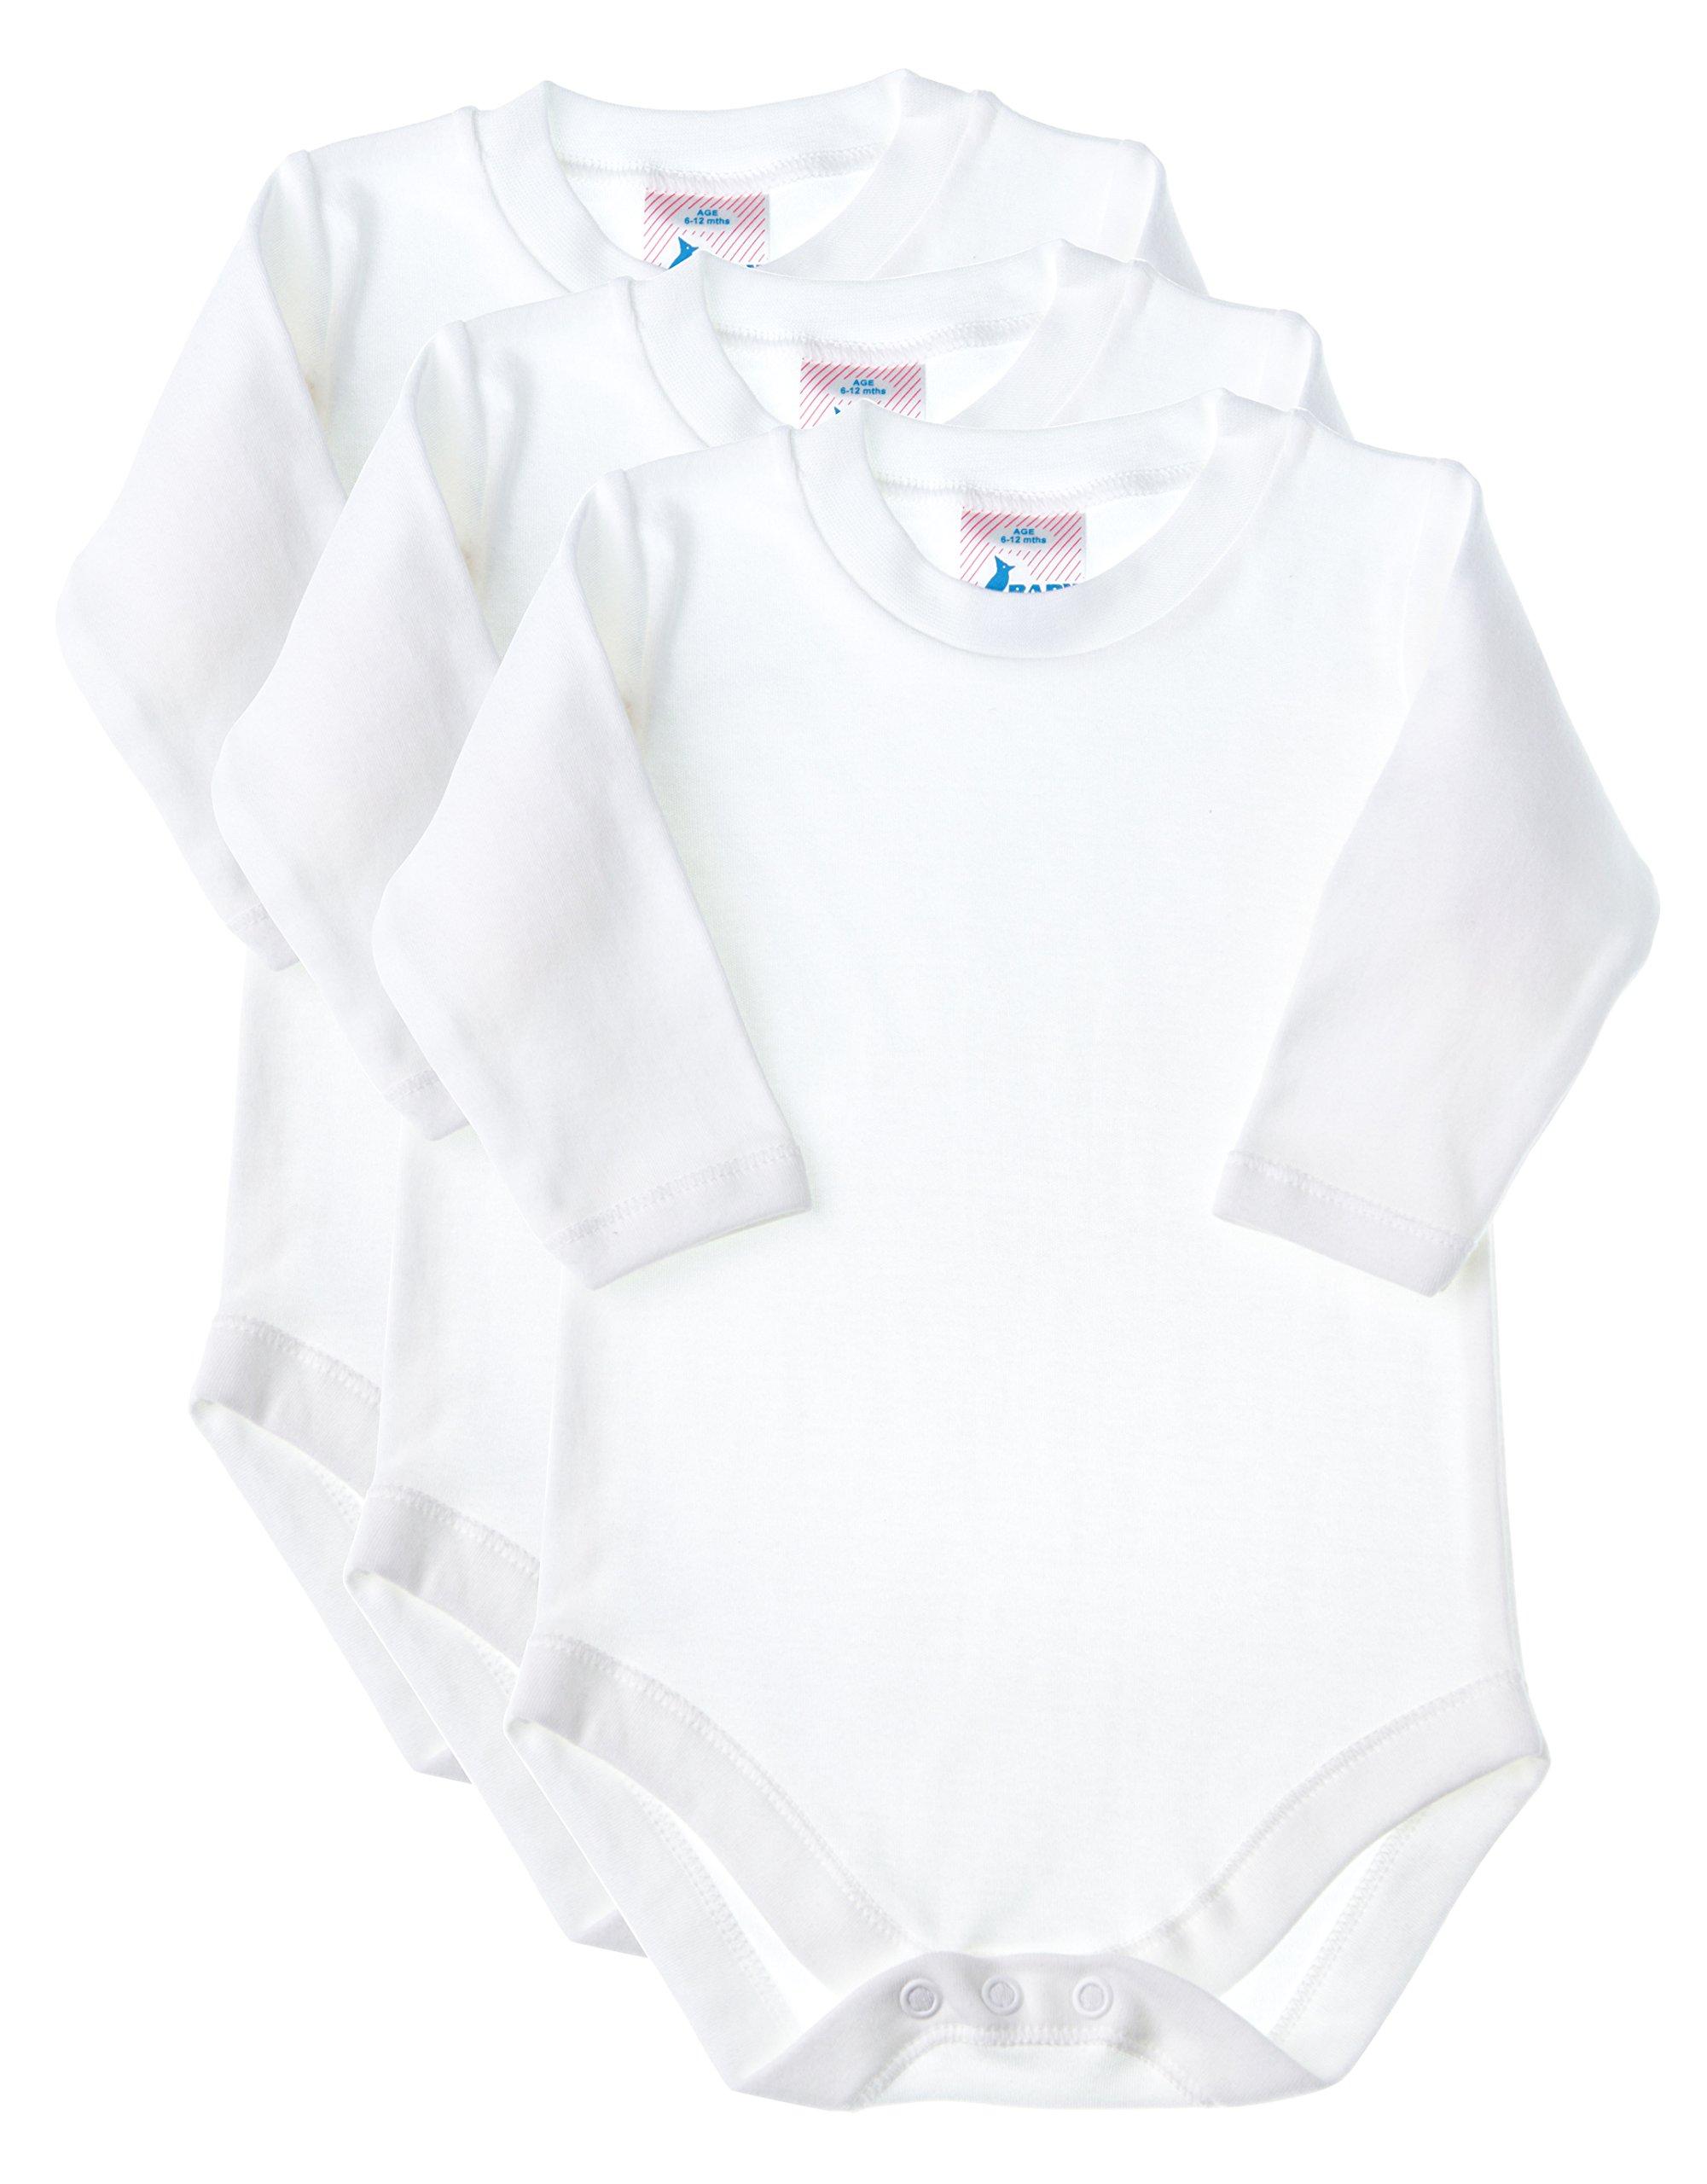 Baby Jay Soft Cotton Onesies, Long Sleeve Unisex Bodysuit, WSLR 12-18 3-Pack